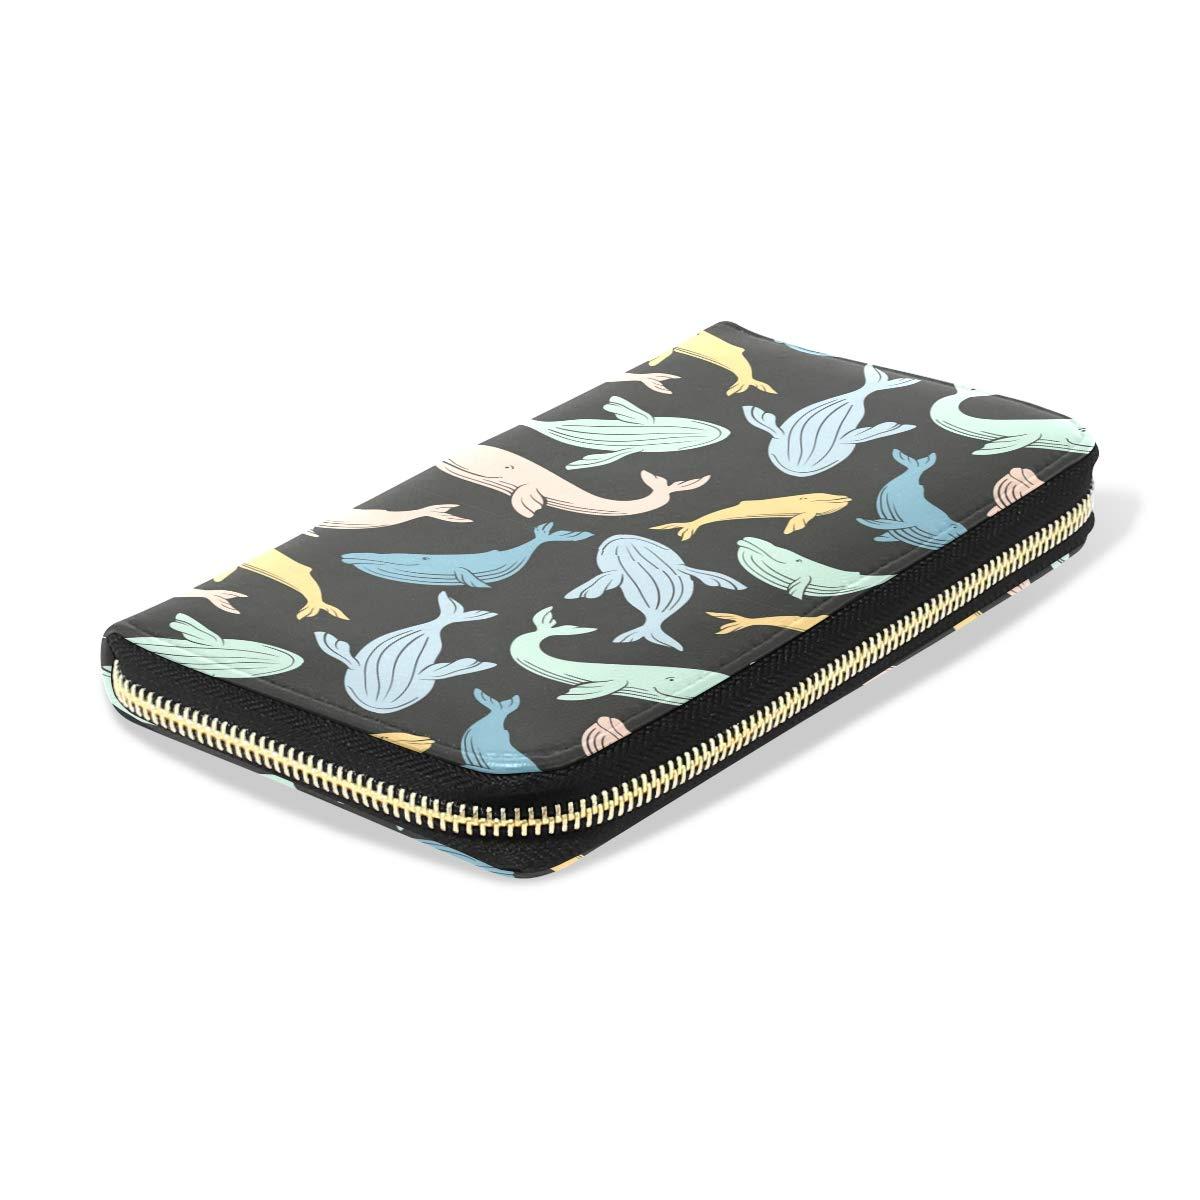 Women Sharks Whales Art Leather Wallet Large Capacity Zipper Travel Wristlet Bags Clutch Cellphone Bag